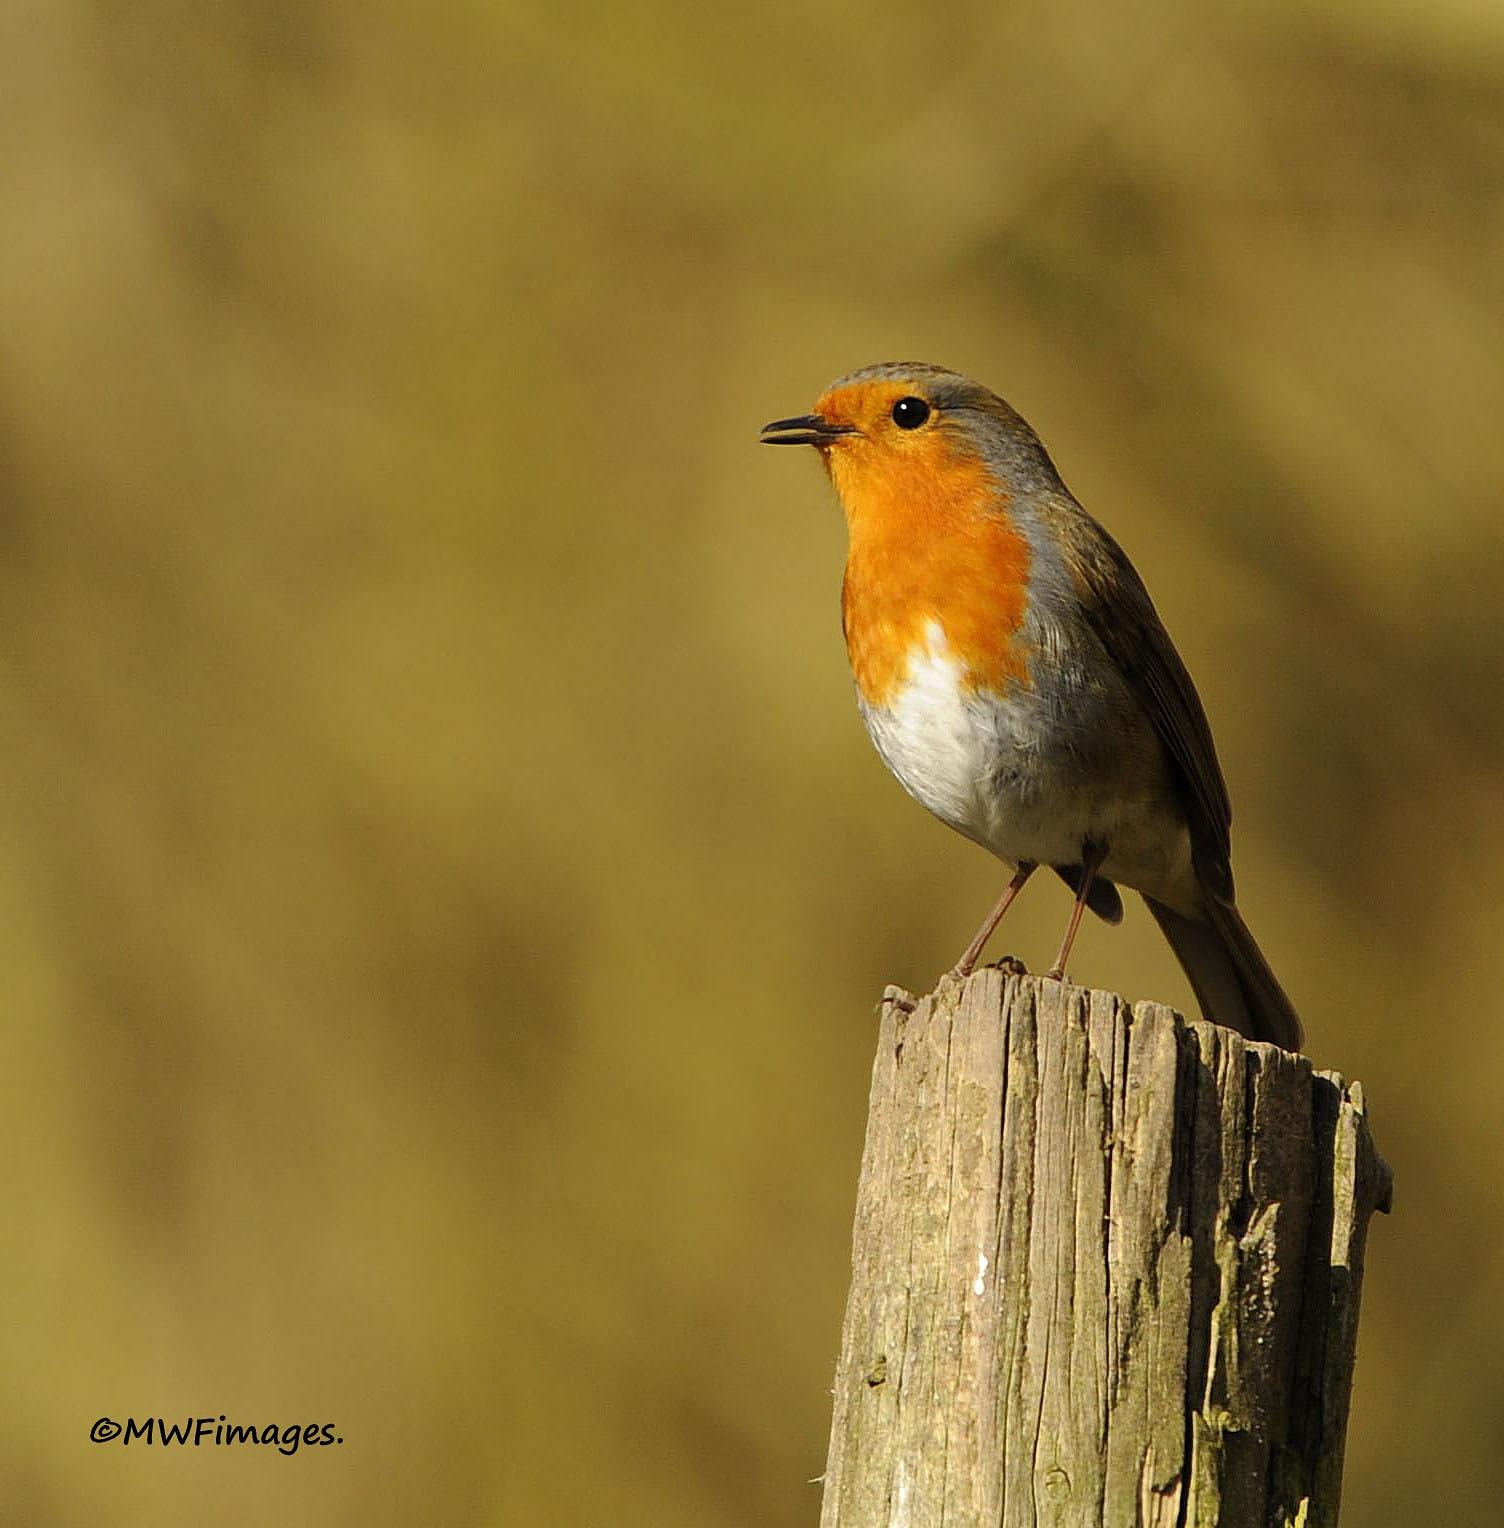 Robin in song by martinfairbairn178